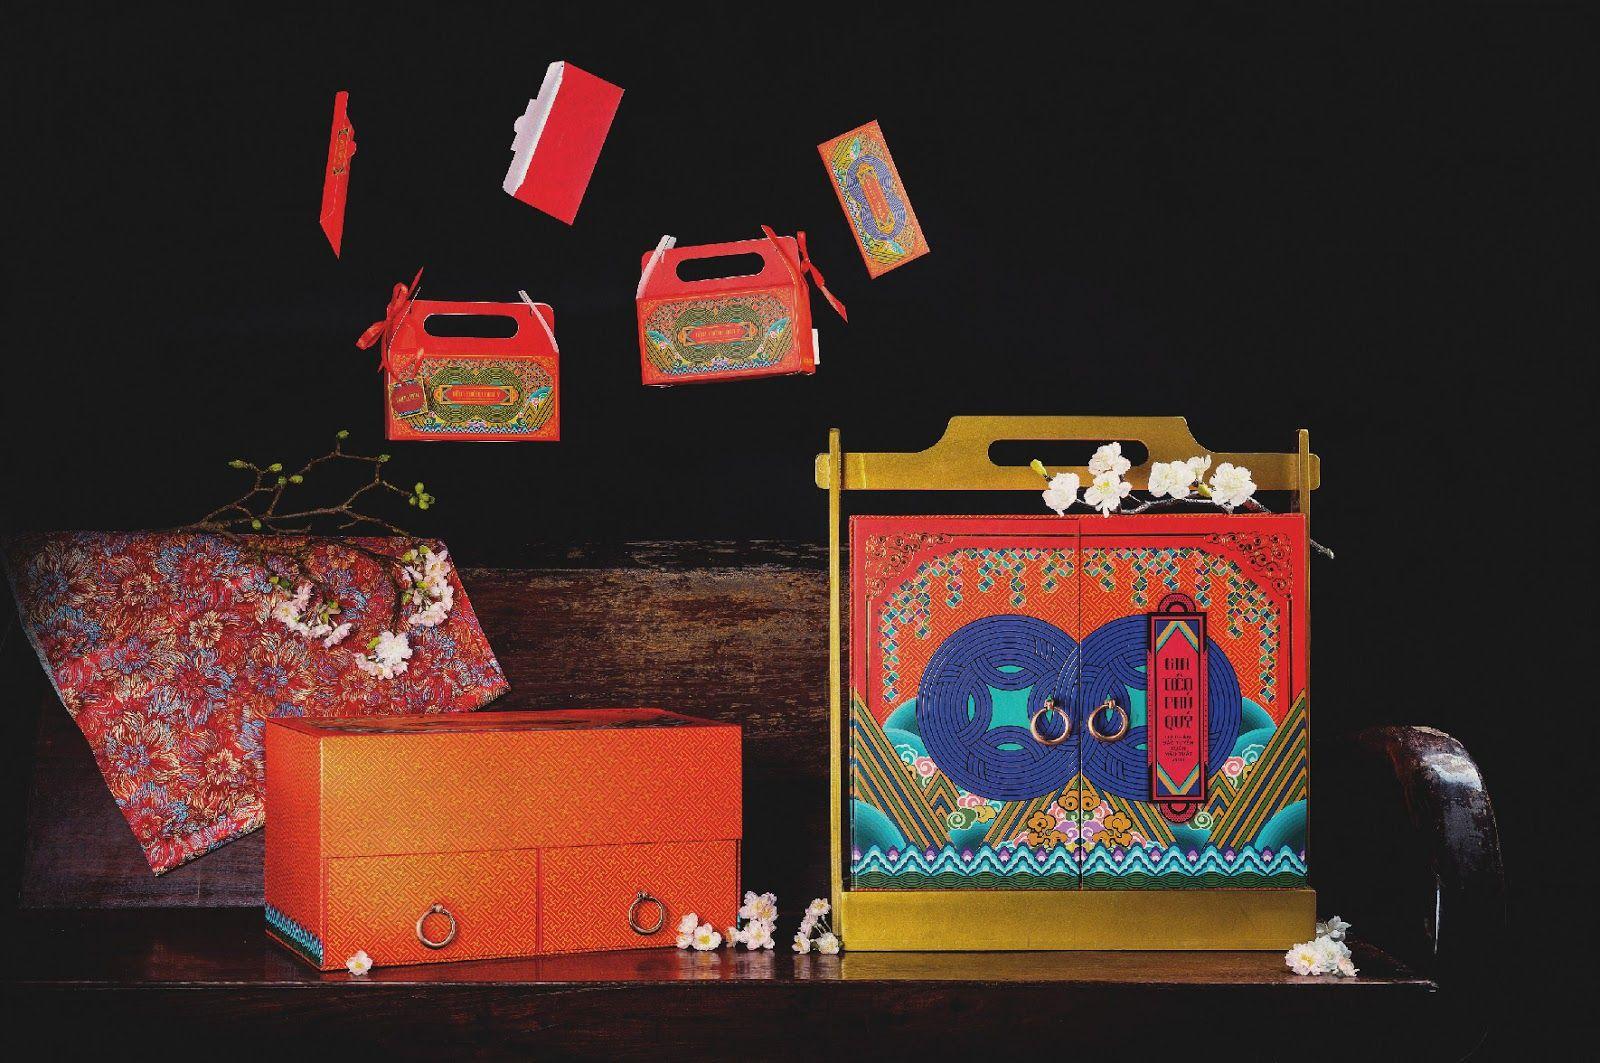 Tet Gift Box 2018 Creative Packaging Design Packaging Design Inspiration Packaging Design